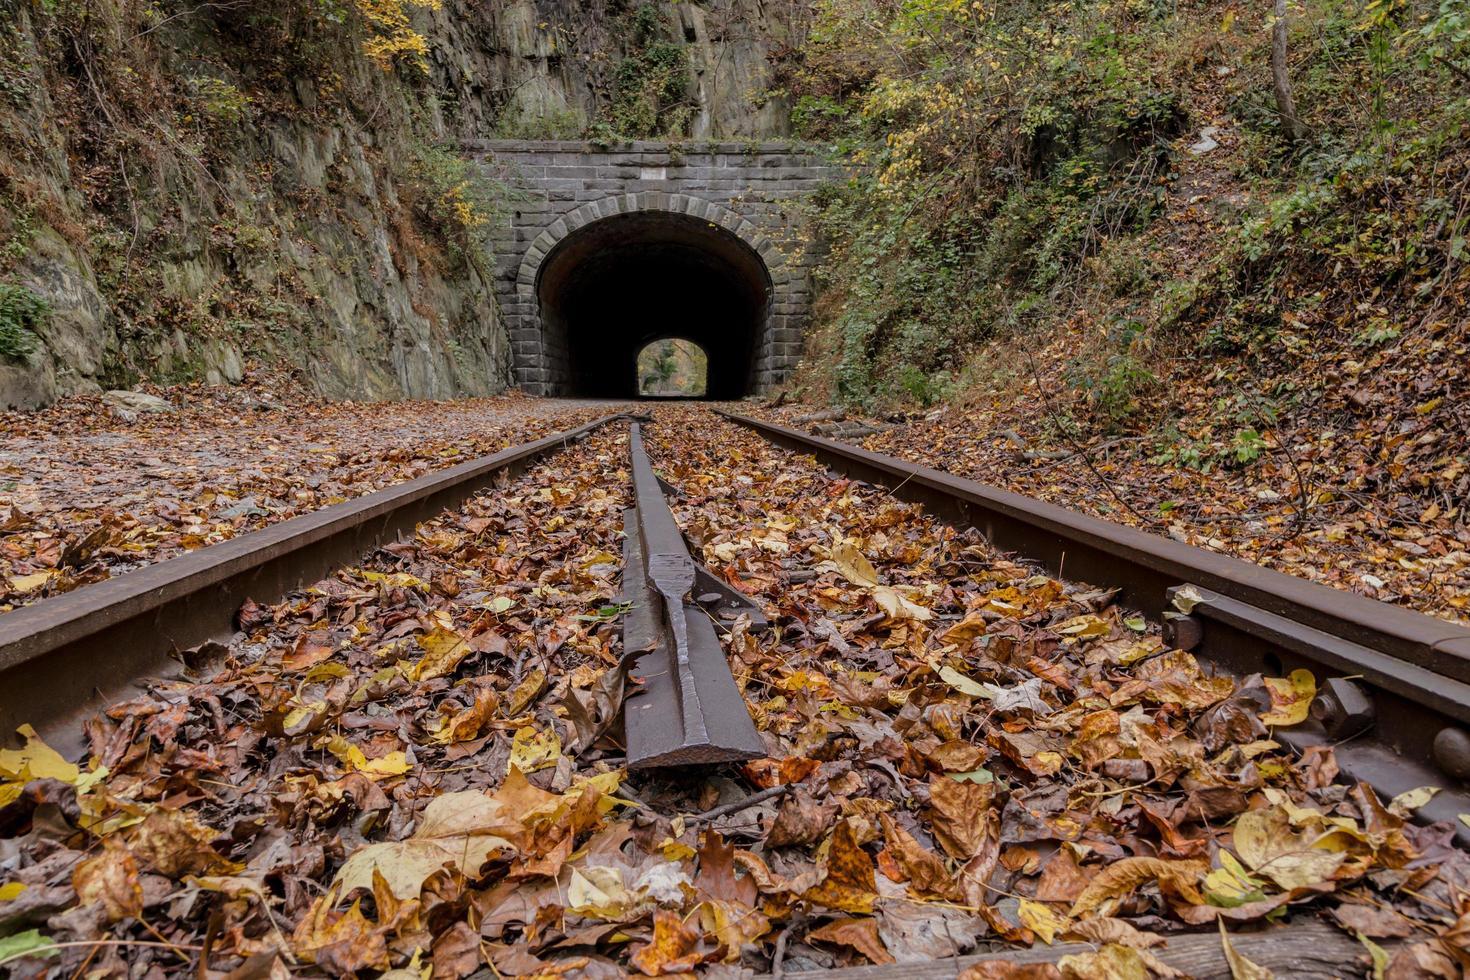 Tunnel and railroad track in autumn photo